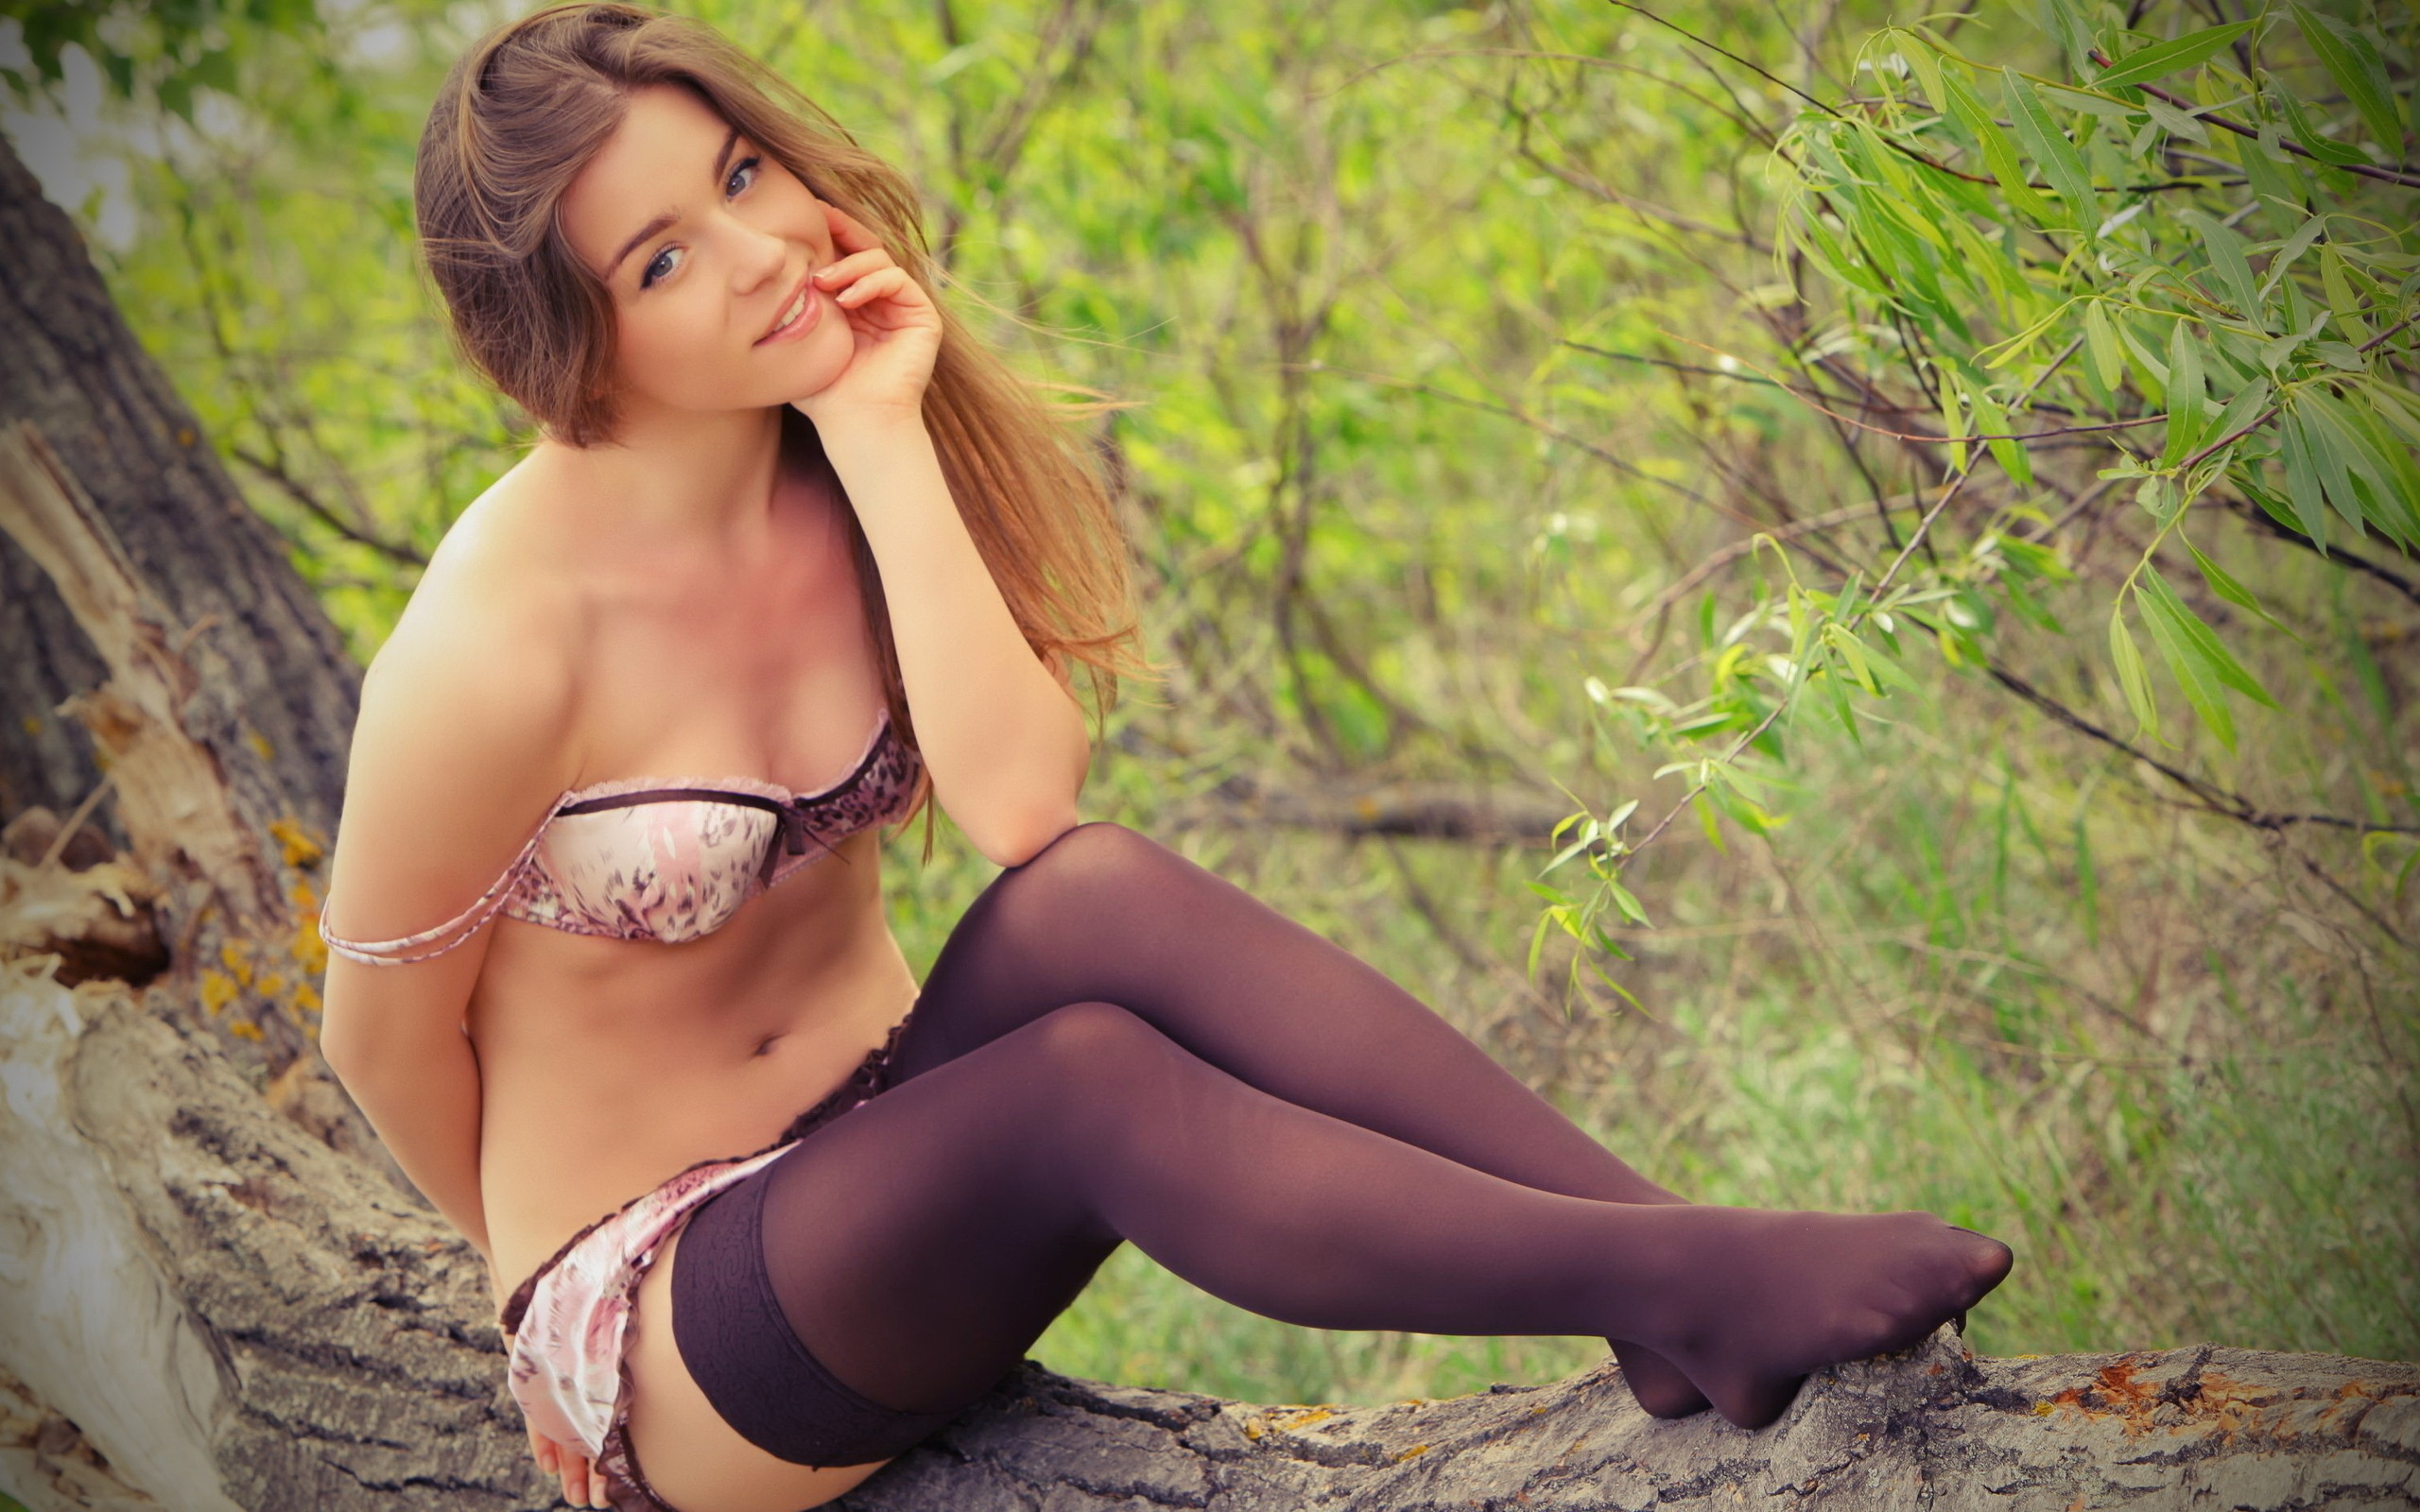 russkaya-devushka-v-seksualnih-chulkah-na-prirode